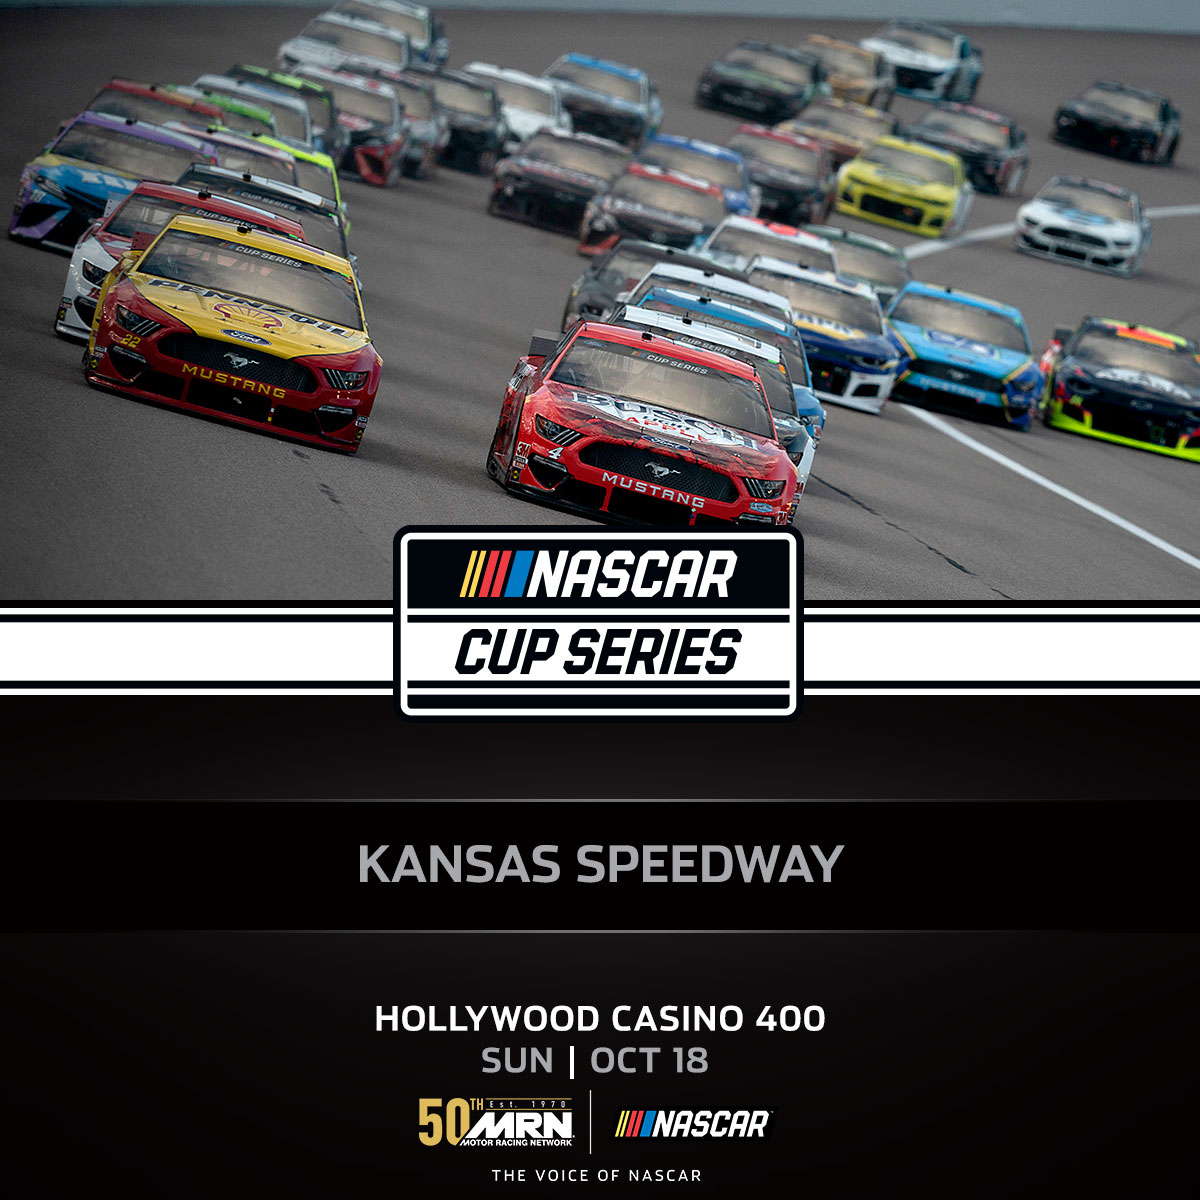 COMING UP IN ONE HOUR! Tune in for the #HC400 @kansasspeedway #AskMRN | #NASCARPlayoffs